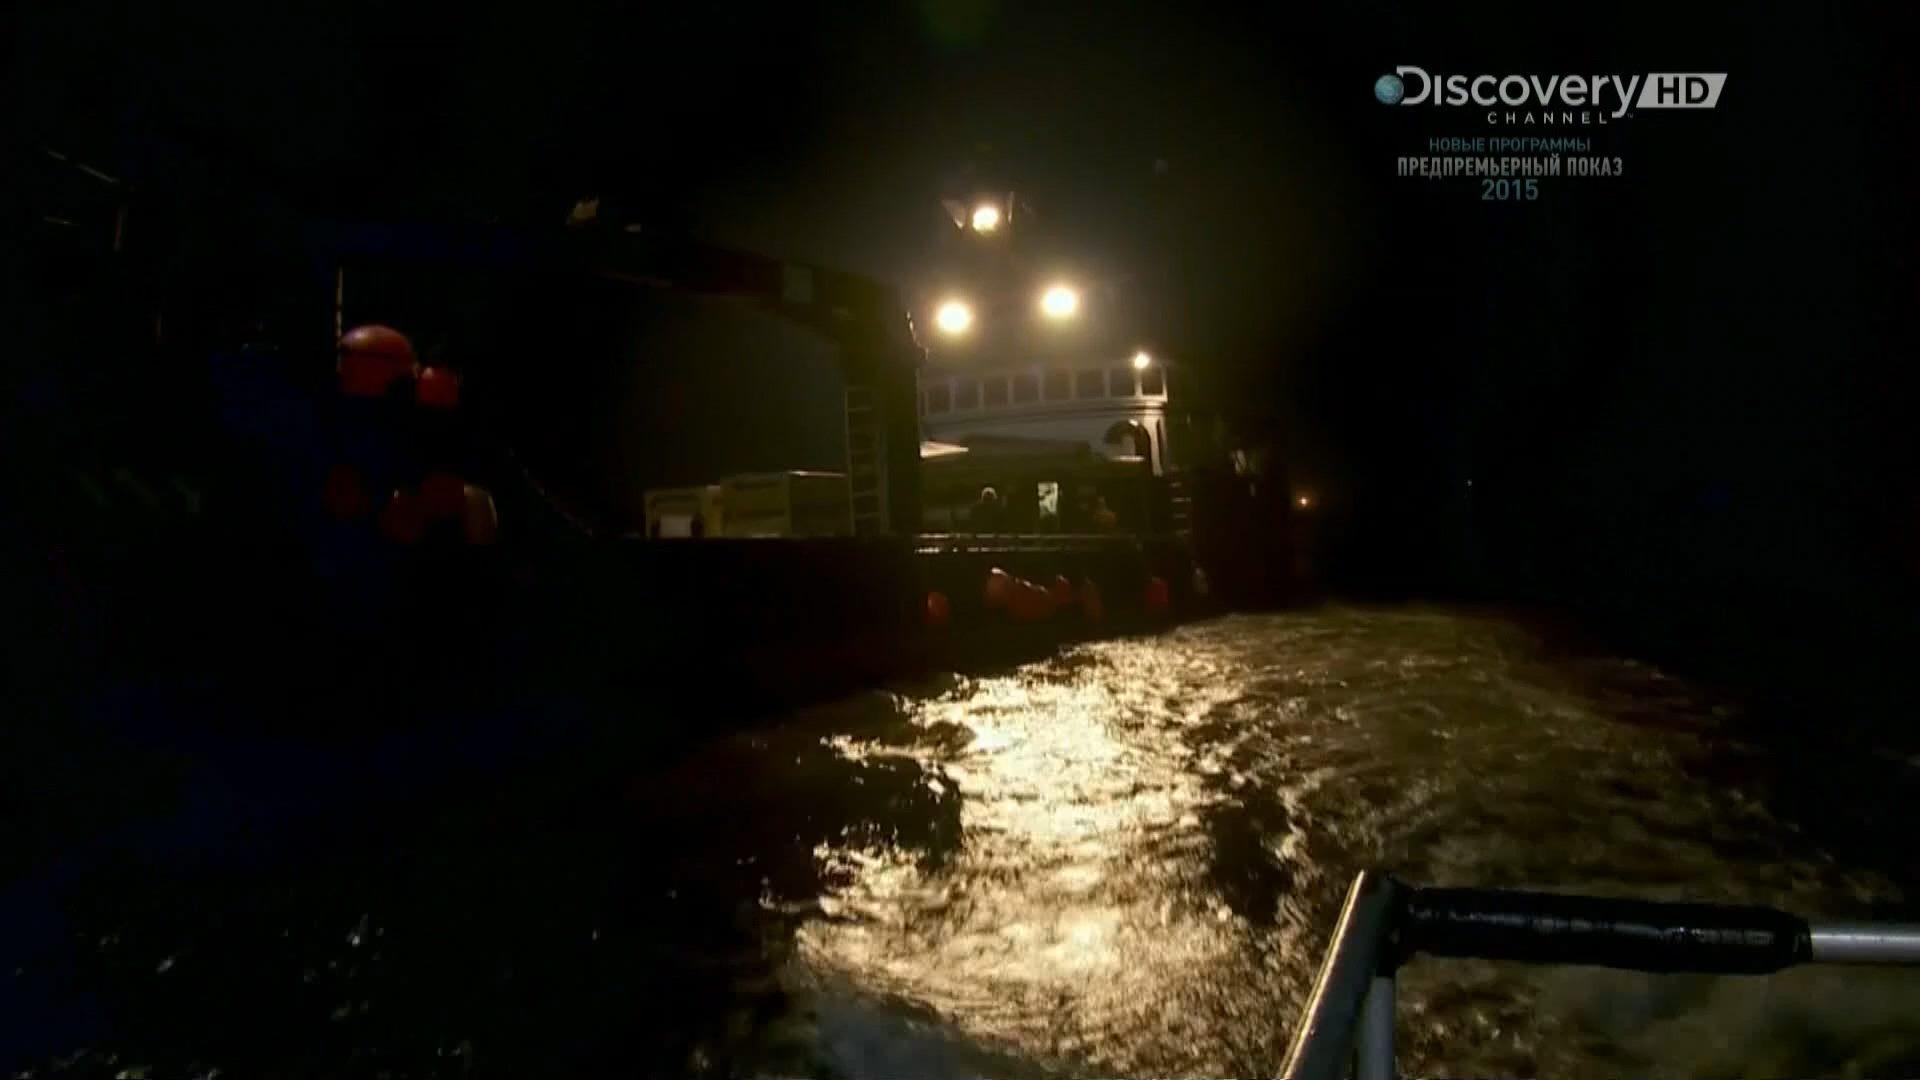 Discovery. Бристольский залив / Alaska: Battle on the Bay (Серии 1-8 из 8) (2014) HDTV 1080i